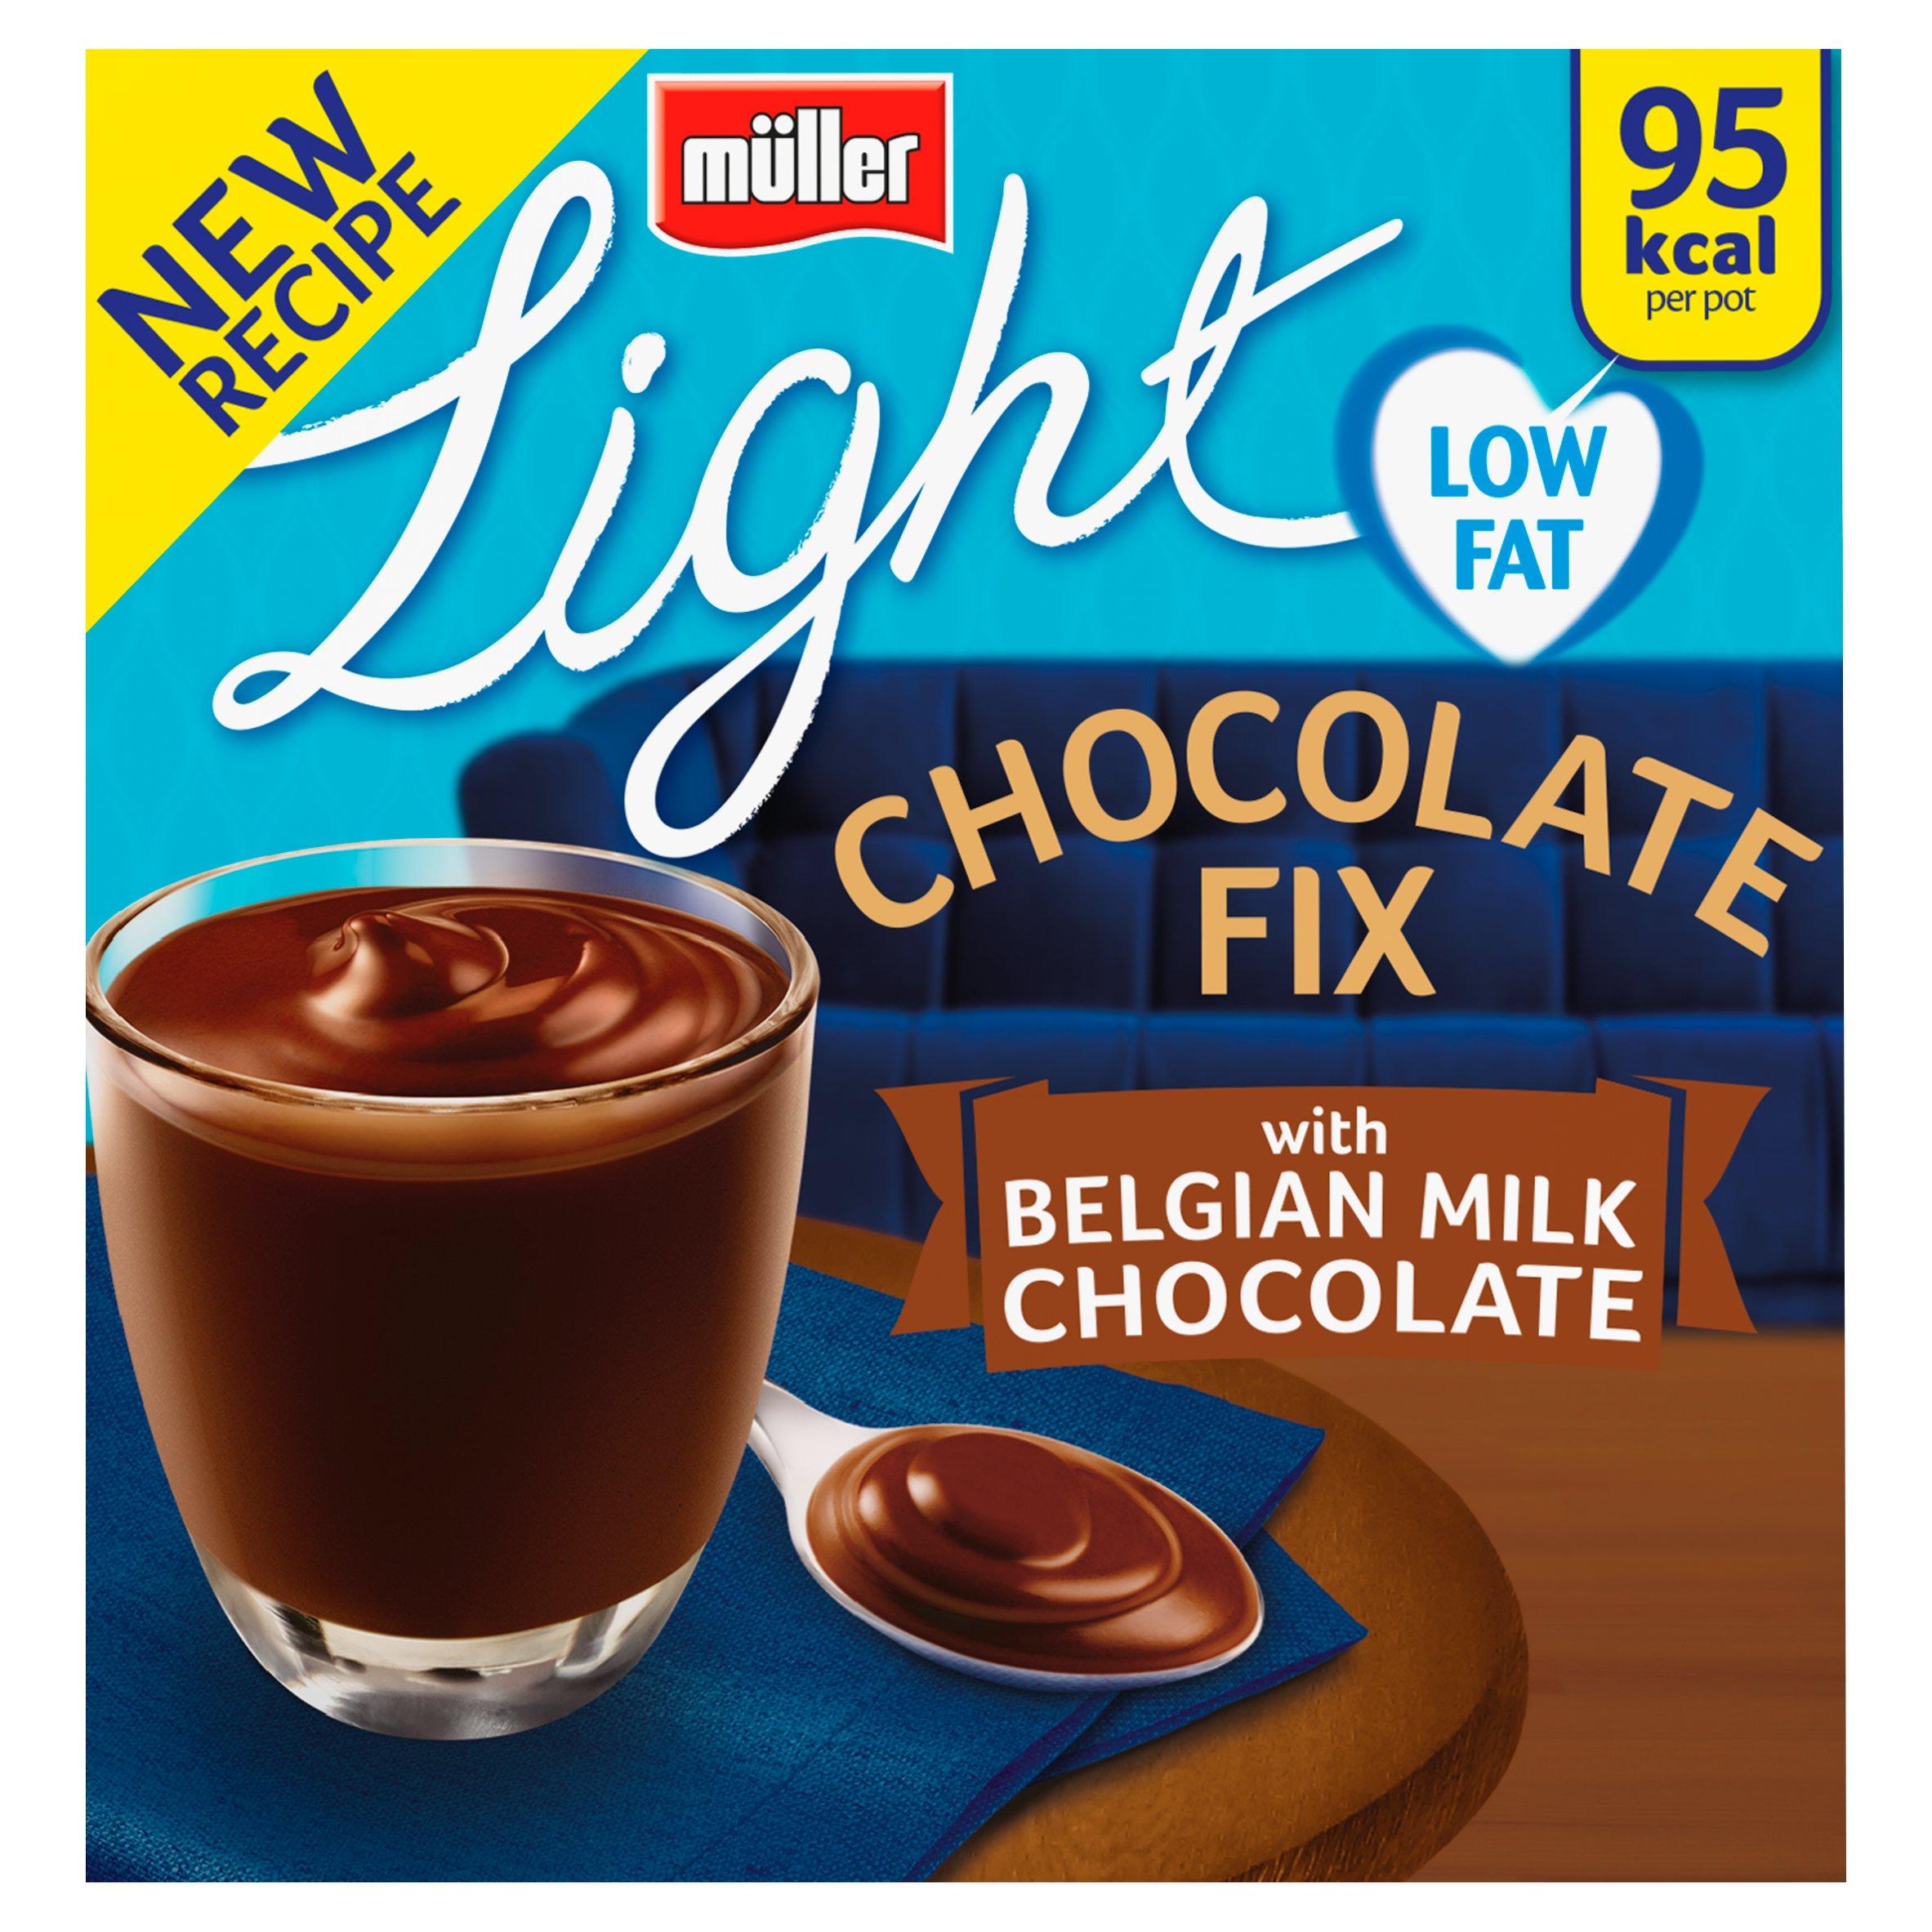 Muller Light Chocolate Fix Milk Chocolate 4 Pack 400G